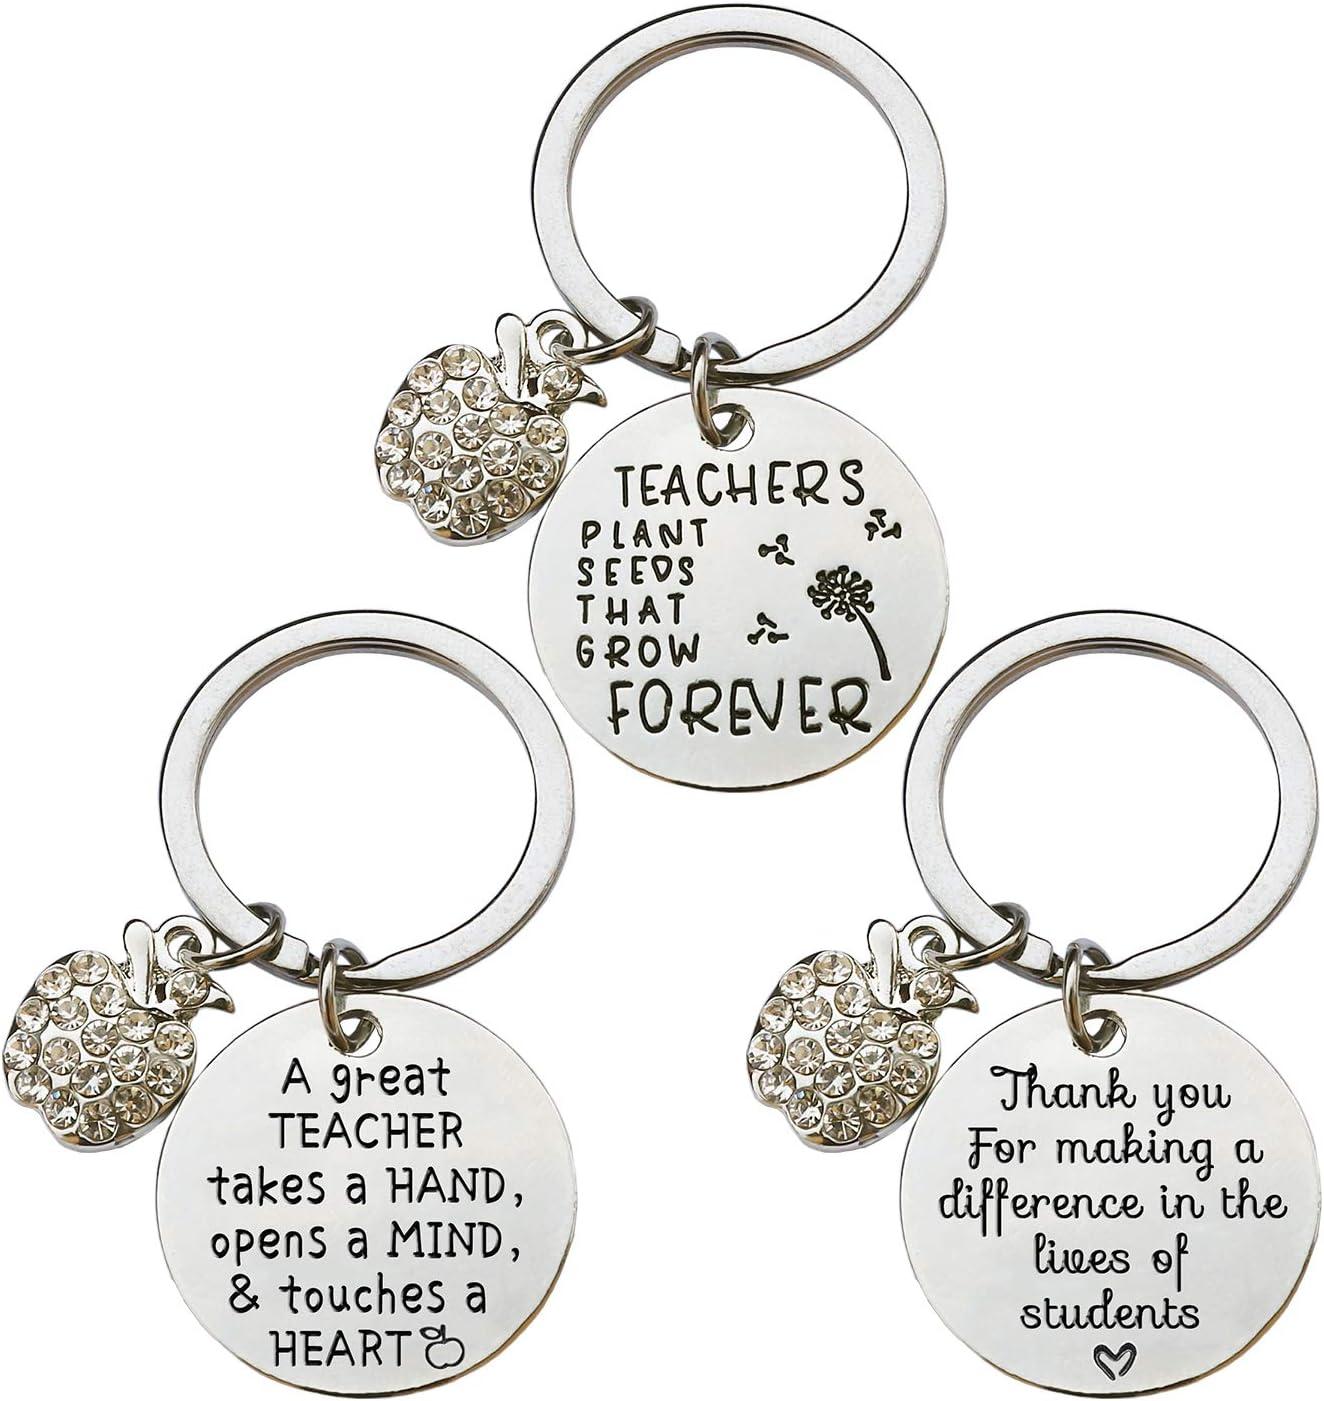 XYBAGS 3 Piece Teacher Appreciation Gifts for Women, Teacher Keychain Jewelry Gift, Graduation Gifts for Teachers Women (Style A)